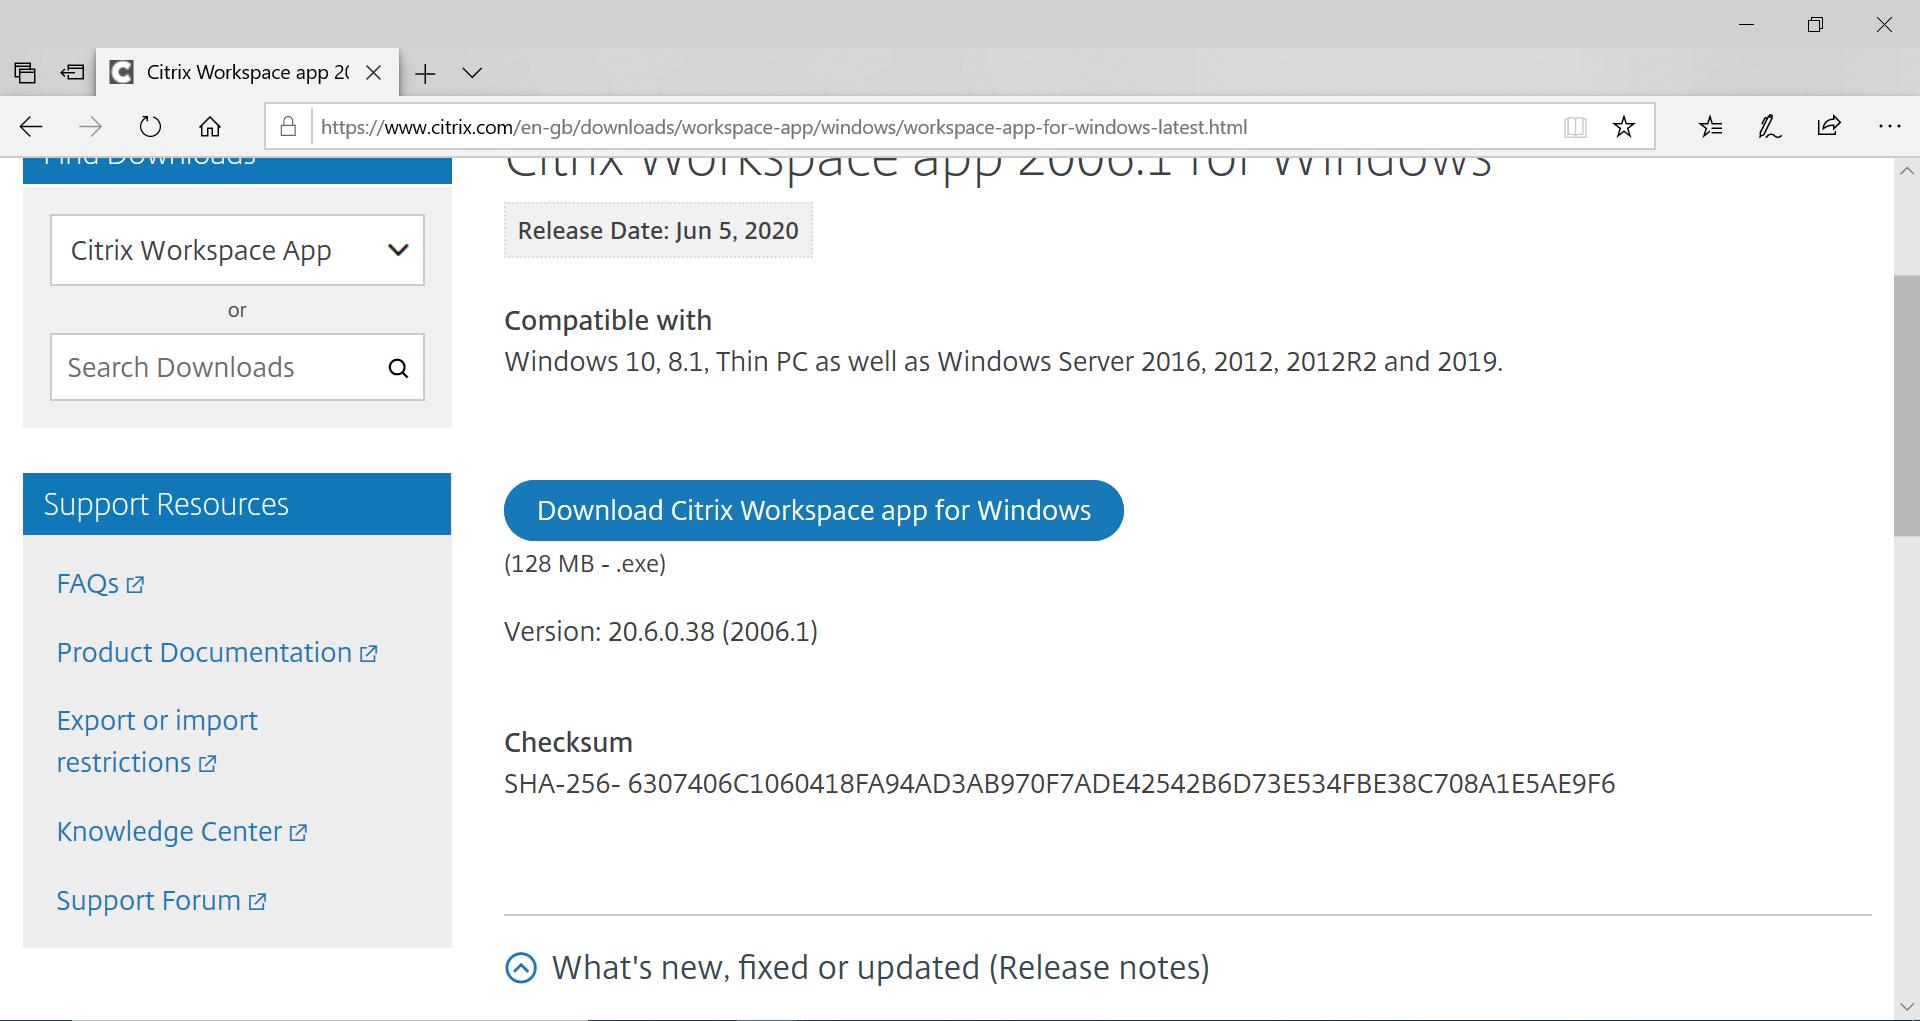 Download Citrix Workspace